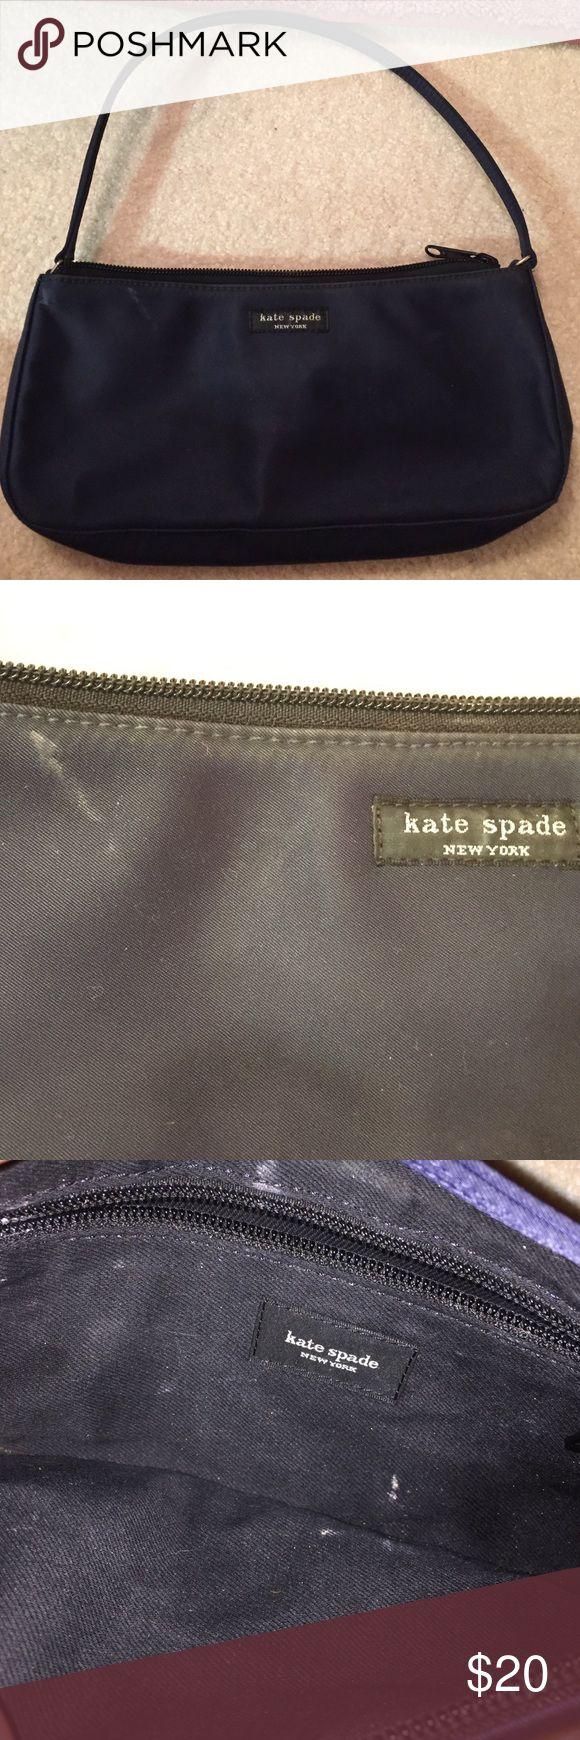 CLOSEOUT Kate Spade Nylon mini bag Small nylon handbag, has some marks on it from makeup, still looks good,  navy color kate spade Bags